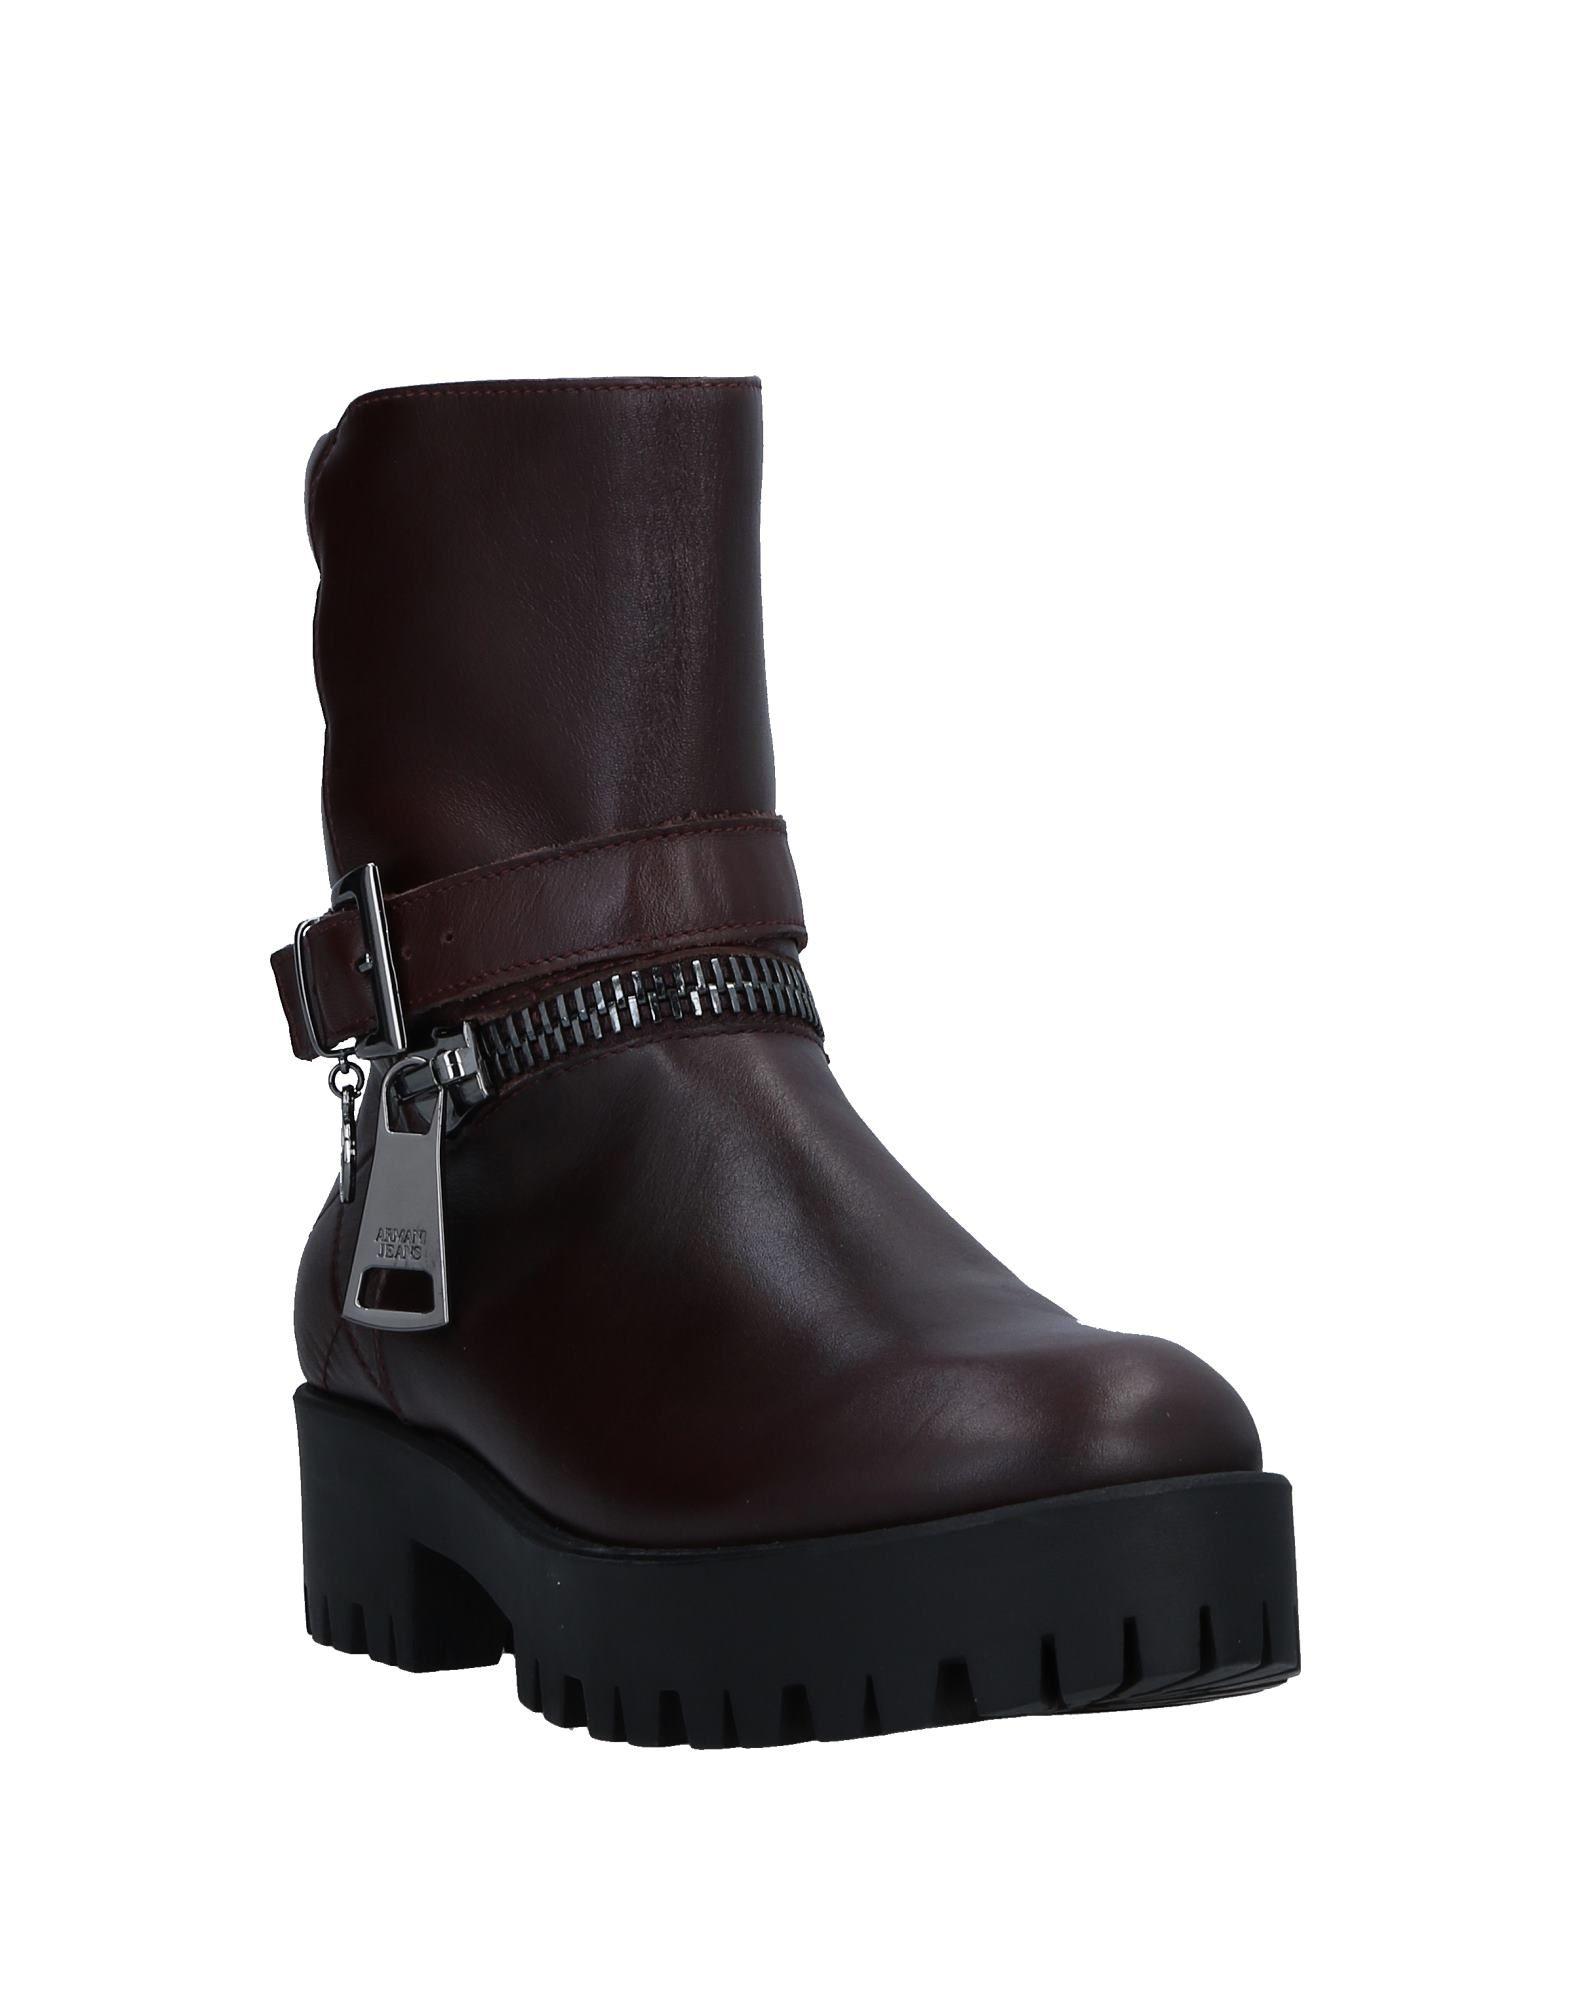 Gut Jeans um billige Schuhe zu tragenArmani Jeans Gut Stiefelette Damen  11313256OL 728315